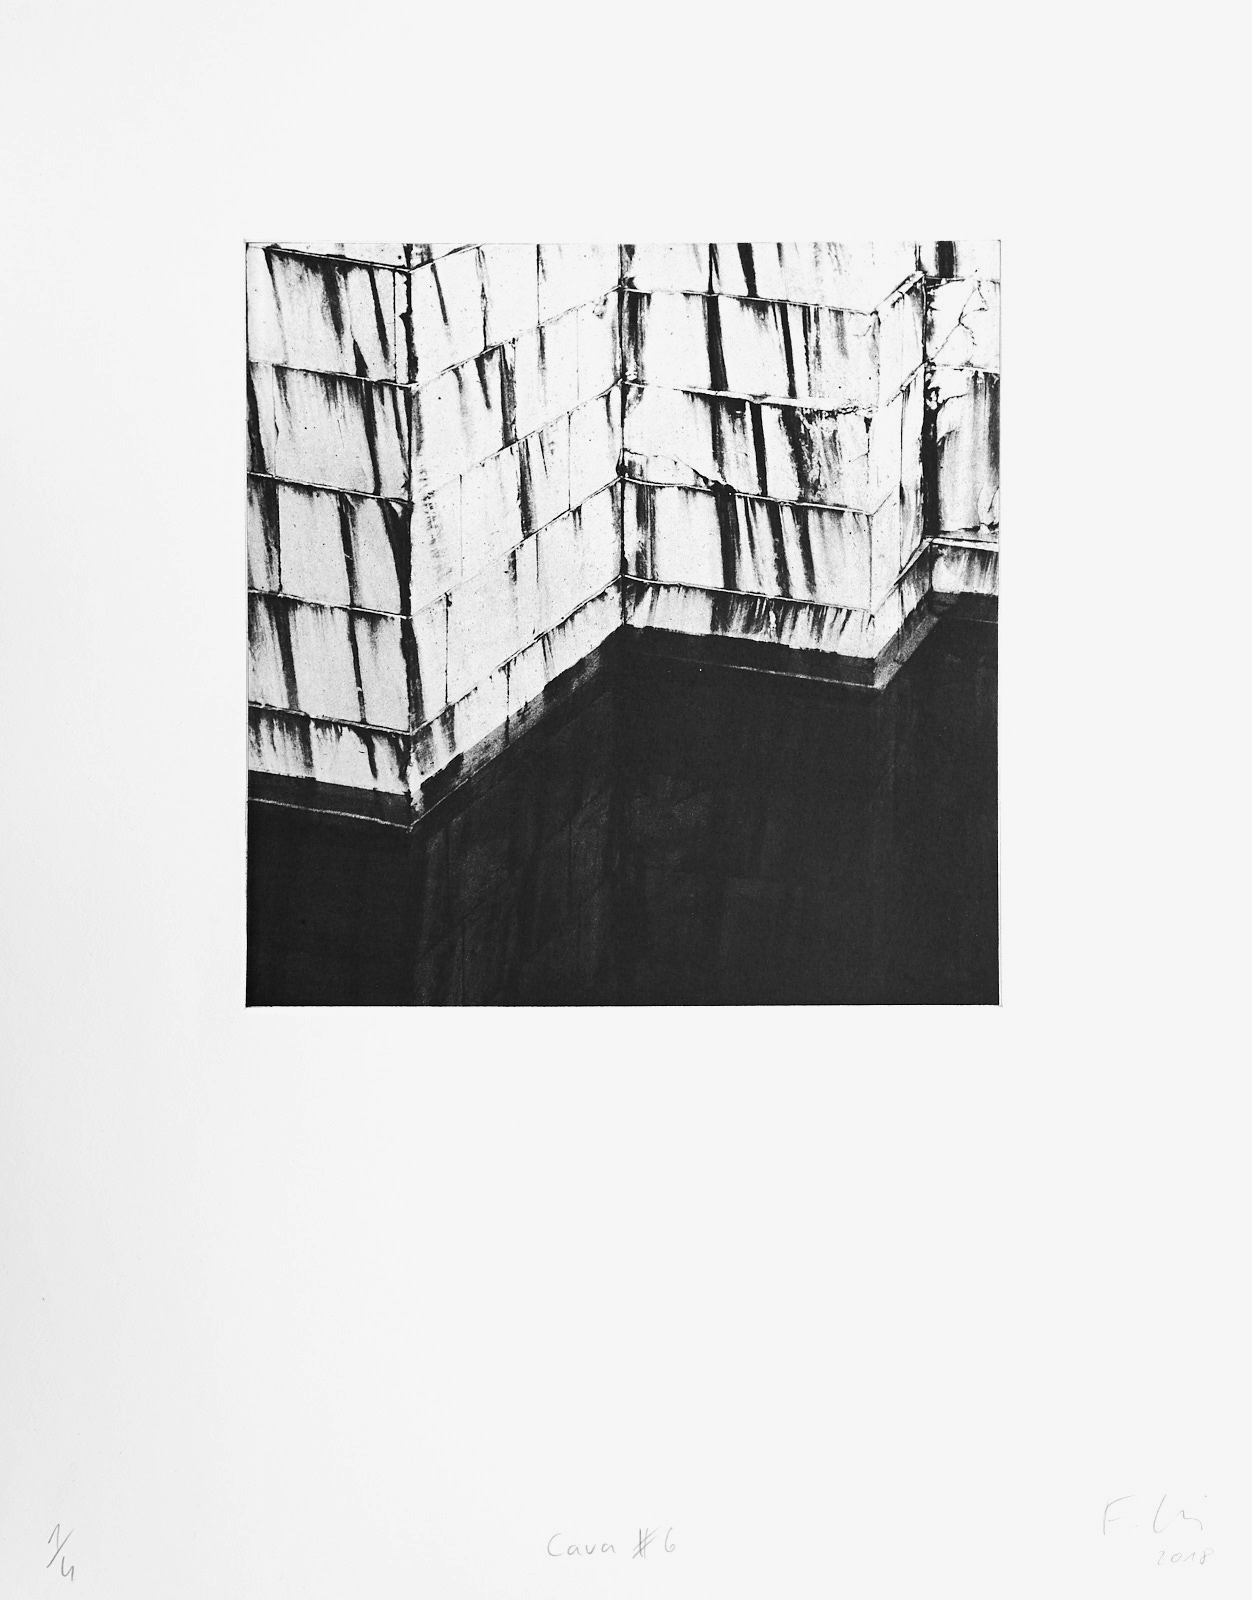 Cava #6 (2018)  medium: Photogravure  size: 36 x 46 cm  paper: Zerkall 270 g/qm  plate: 21.5 x 21.5 cm  edition: 7 copies  numbered: 1/4 - 4/4, 3 e.a.  printer: FWU